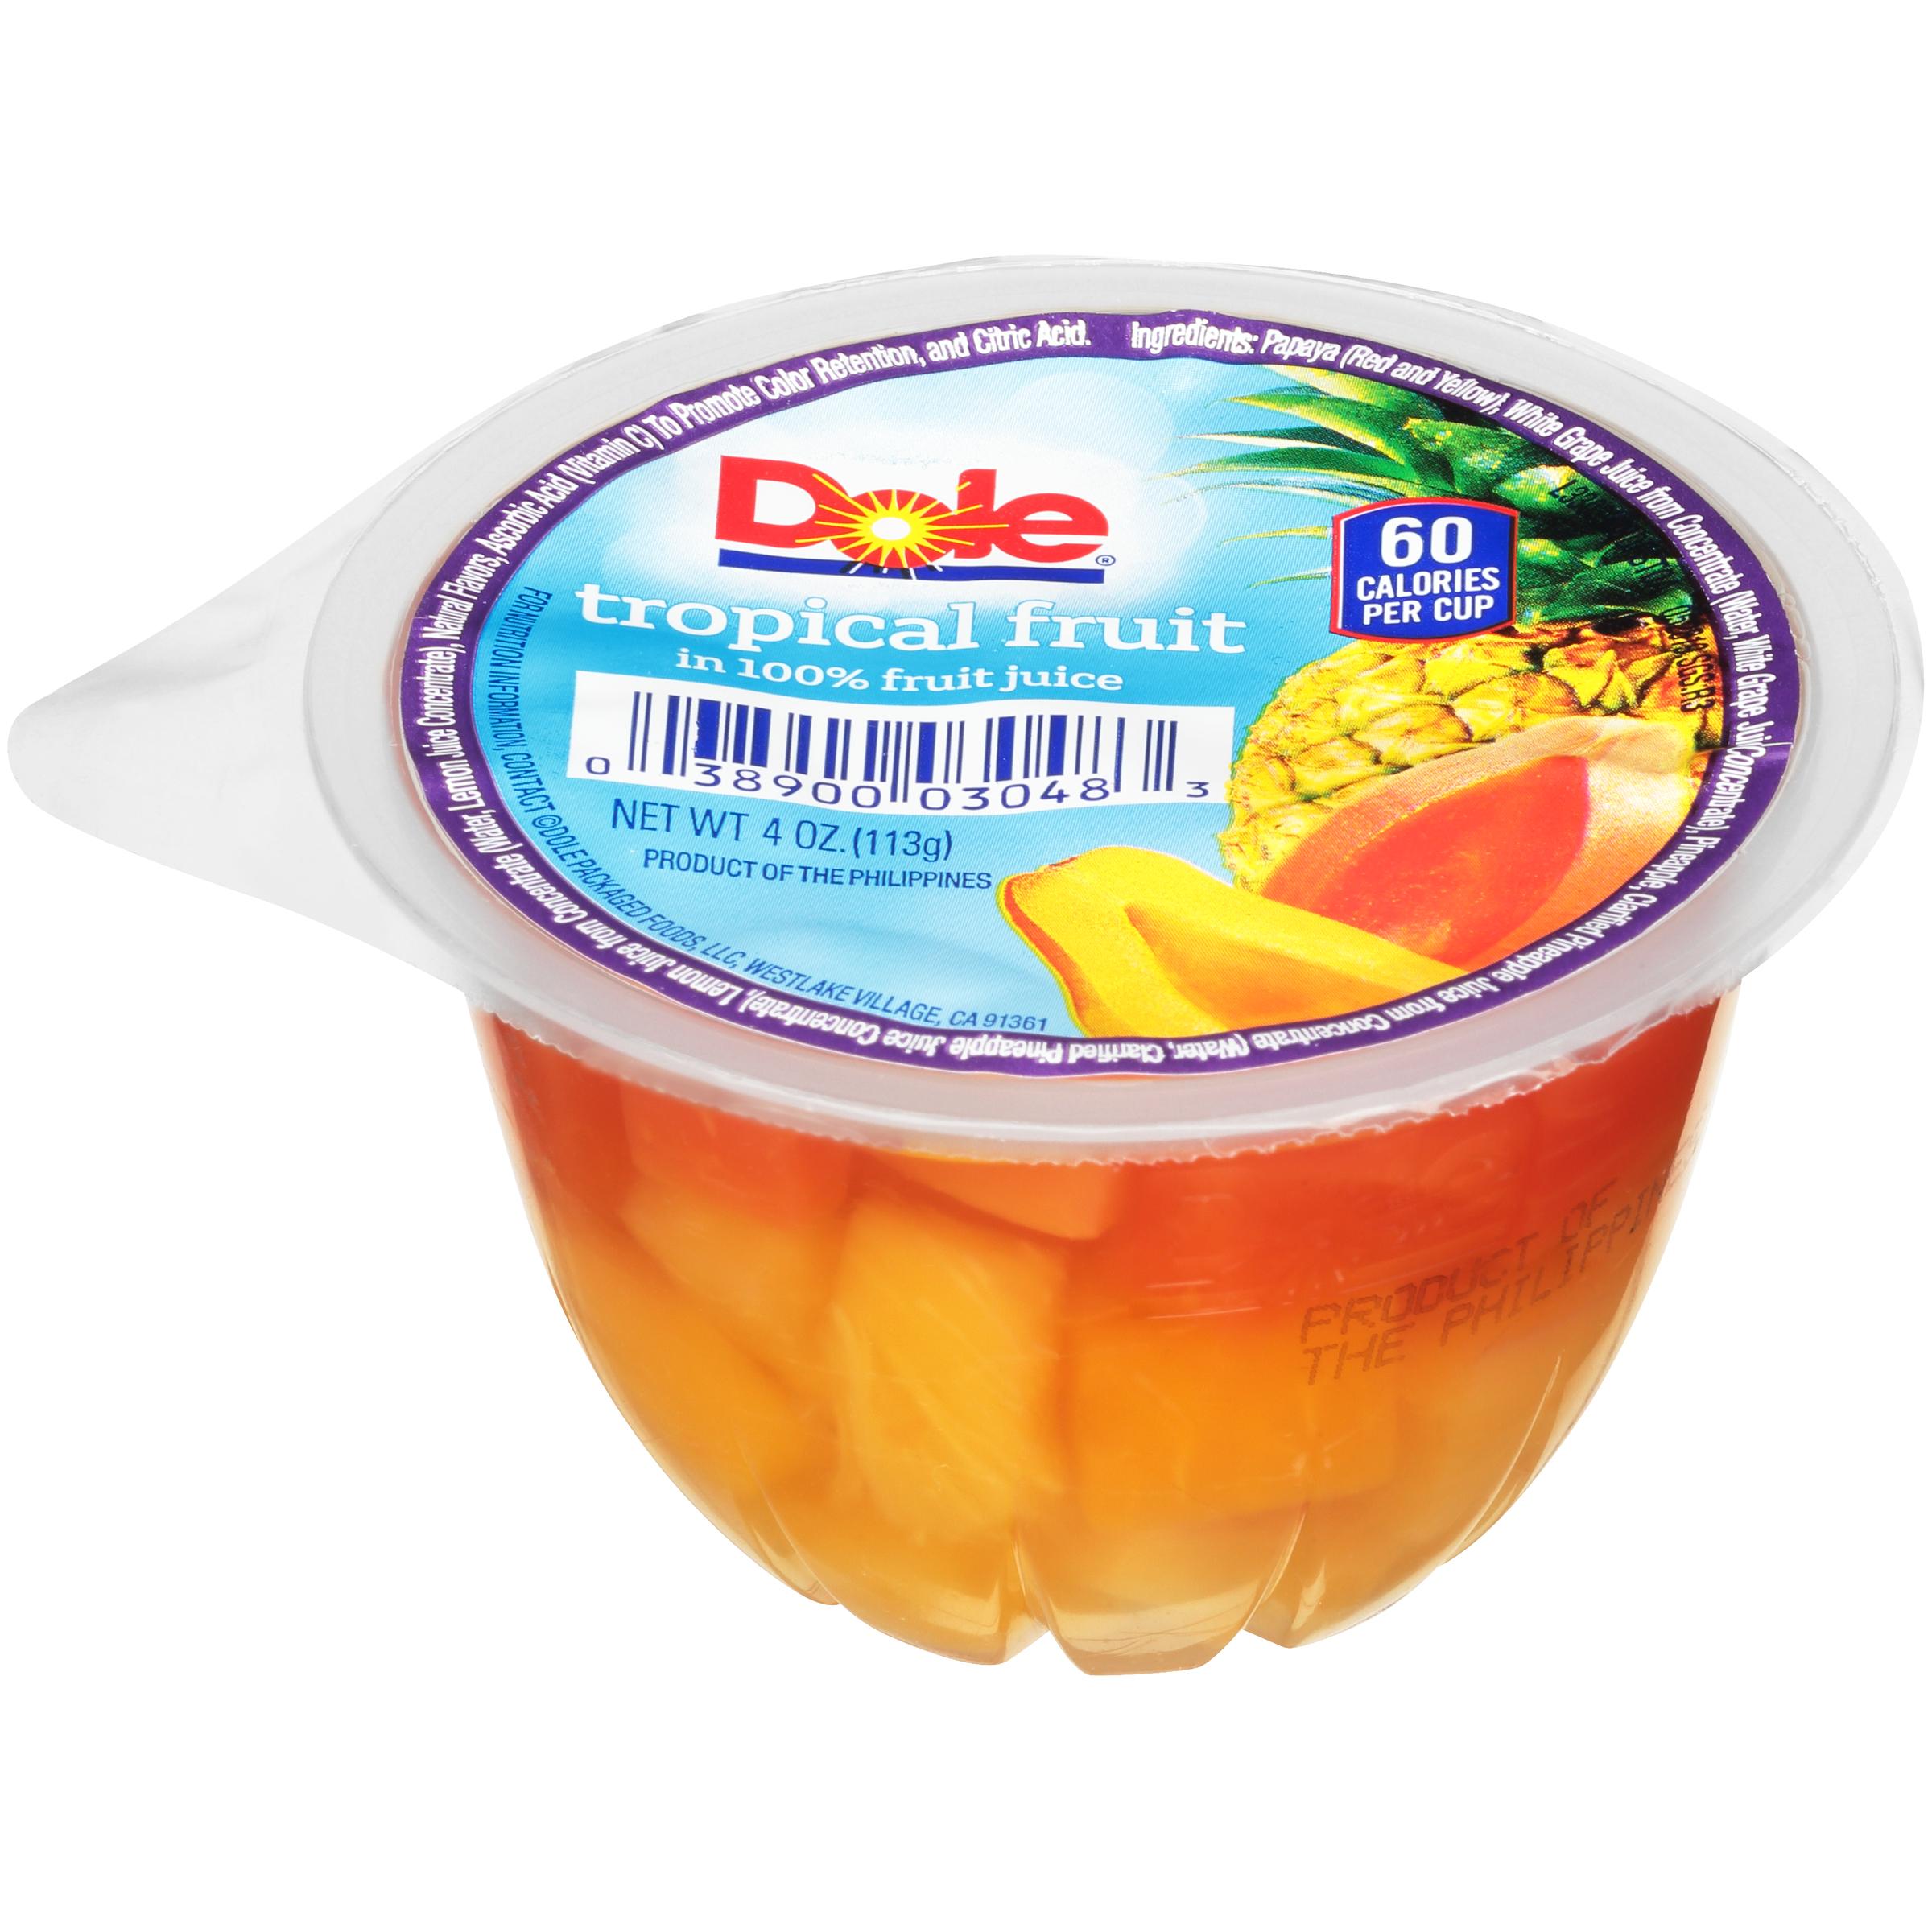 36/4 Tropical Fruit In Juice